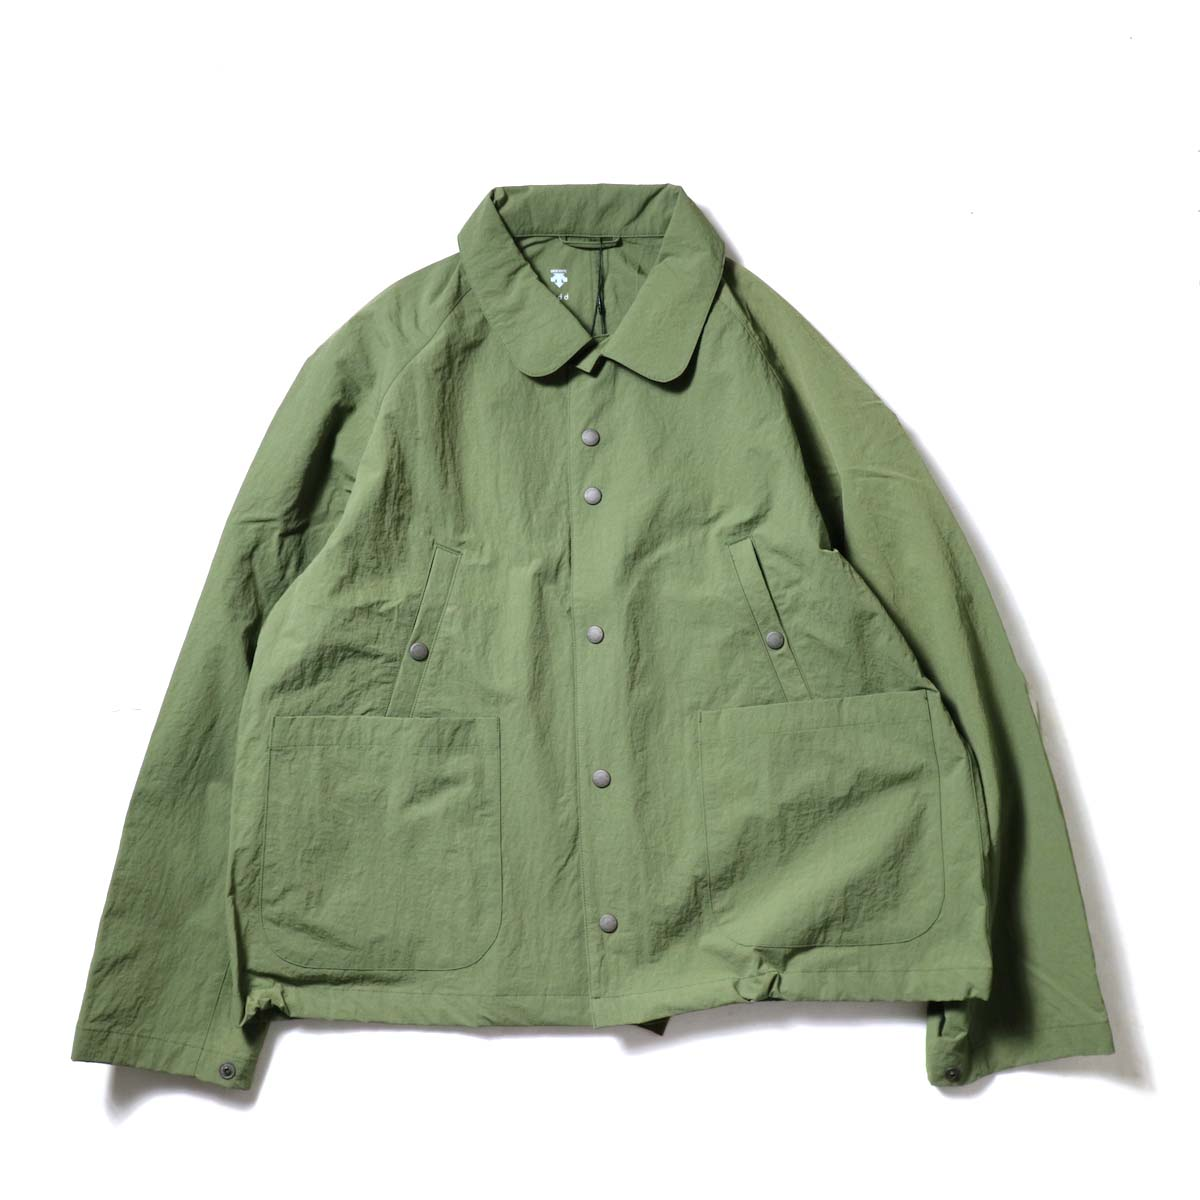 DESCENTE ddd / SWING COACH JACKET (Khaki)